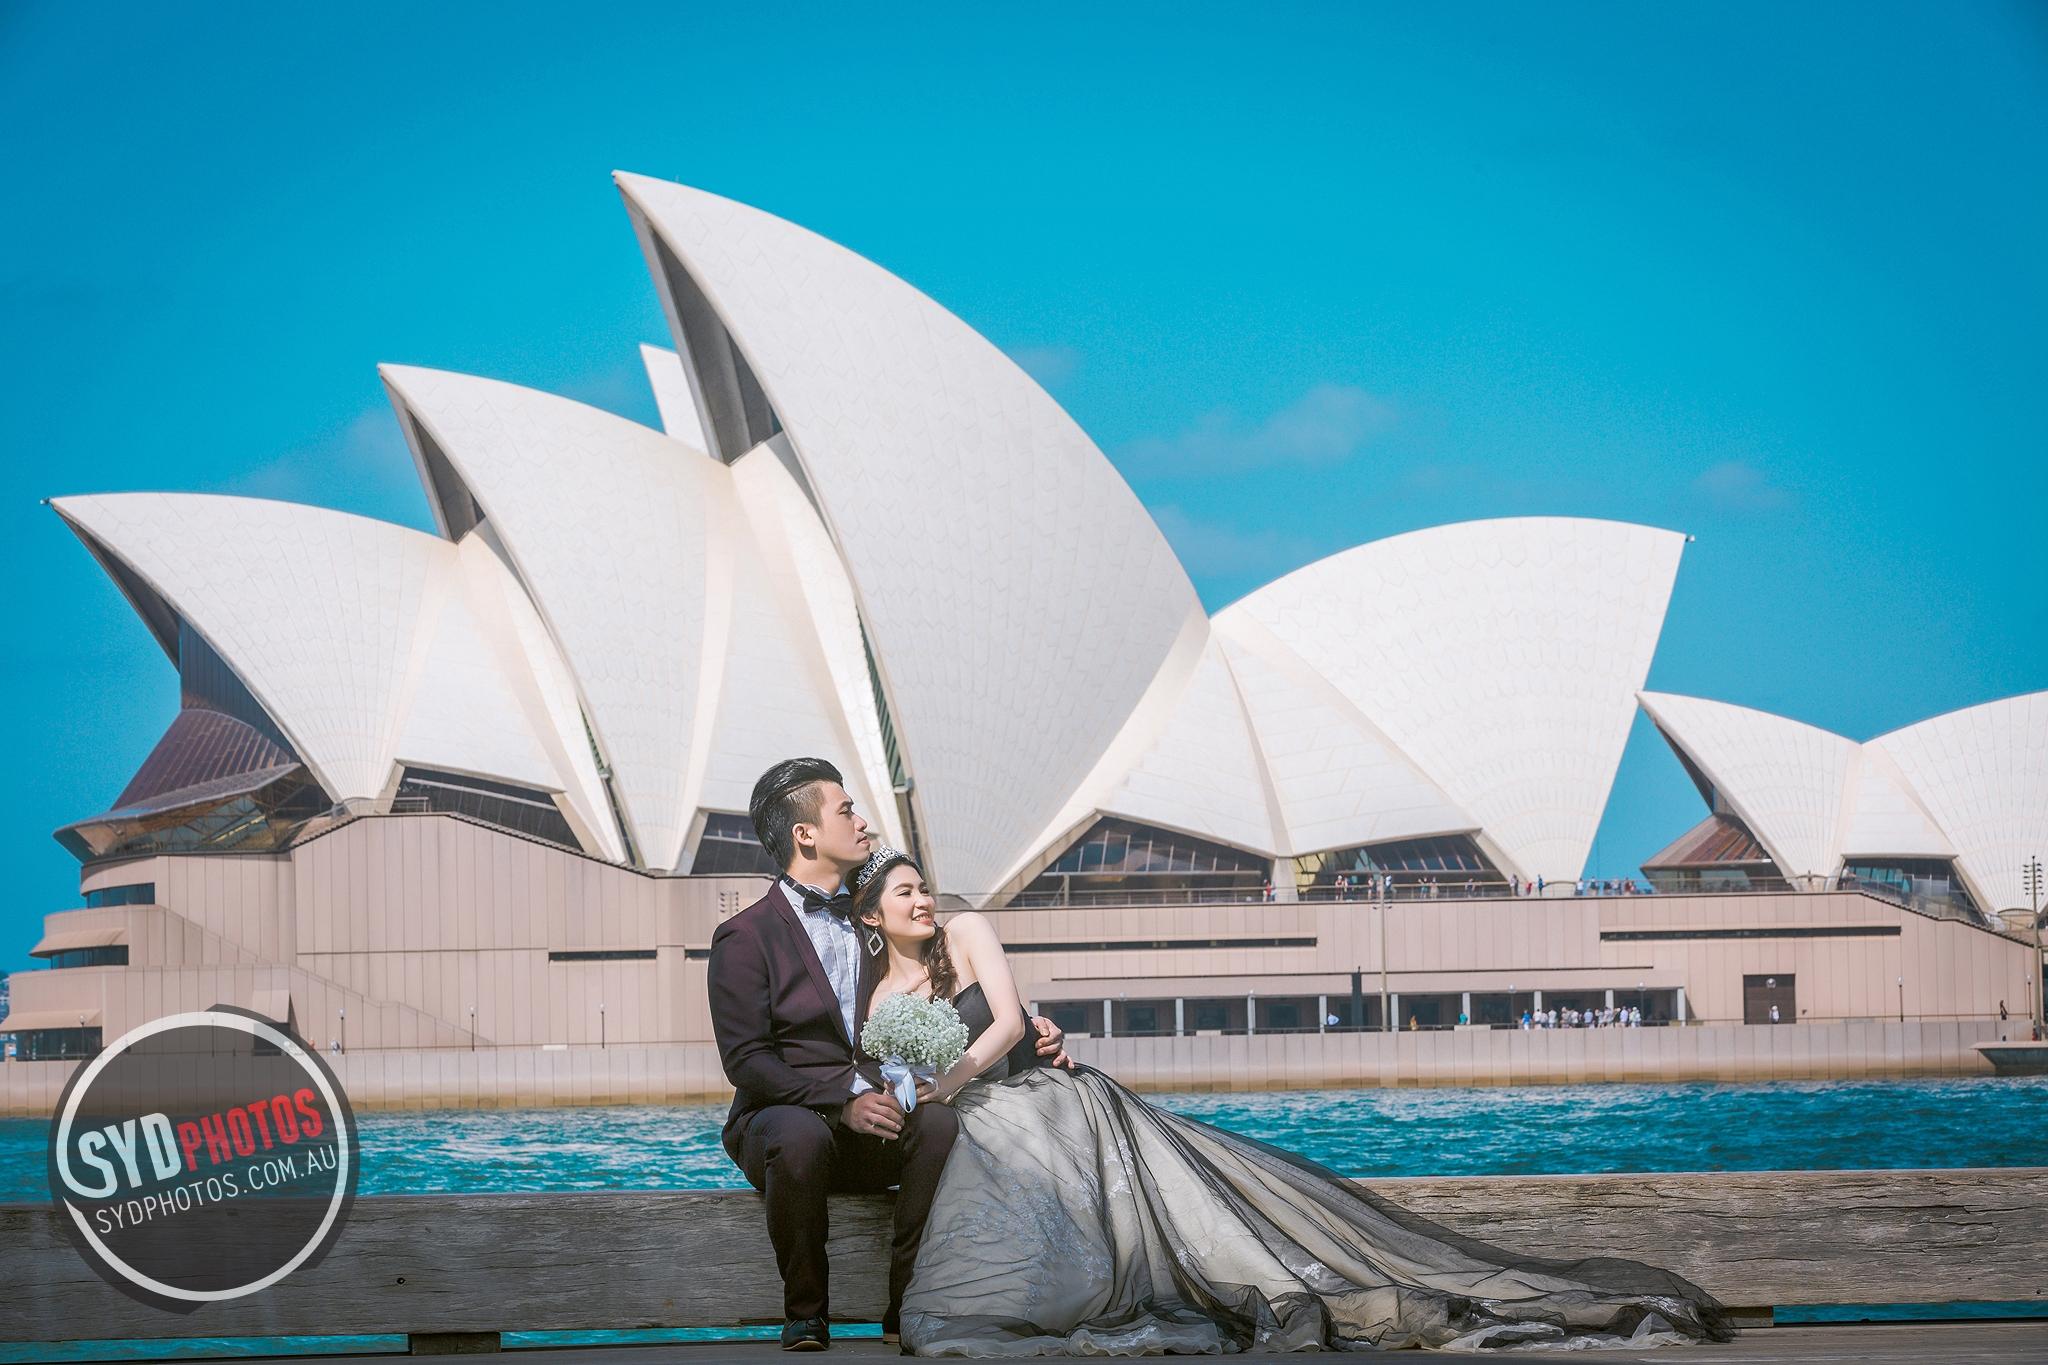 ID-104802-Belle-Prewedding-悉尼婚纱摄影